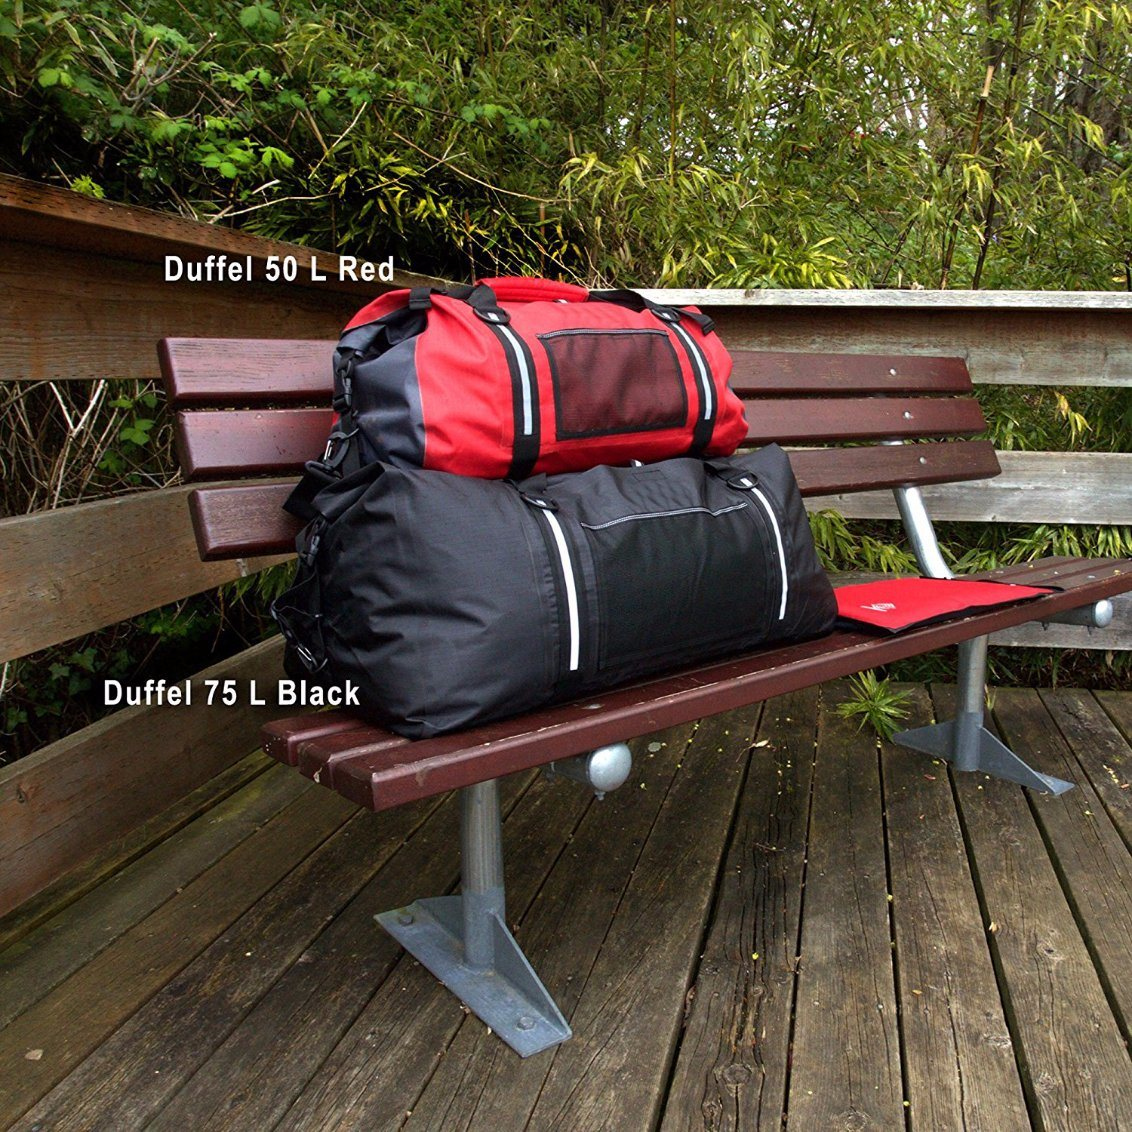 75 L Black 100% Waterproof Duffel Bag